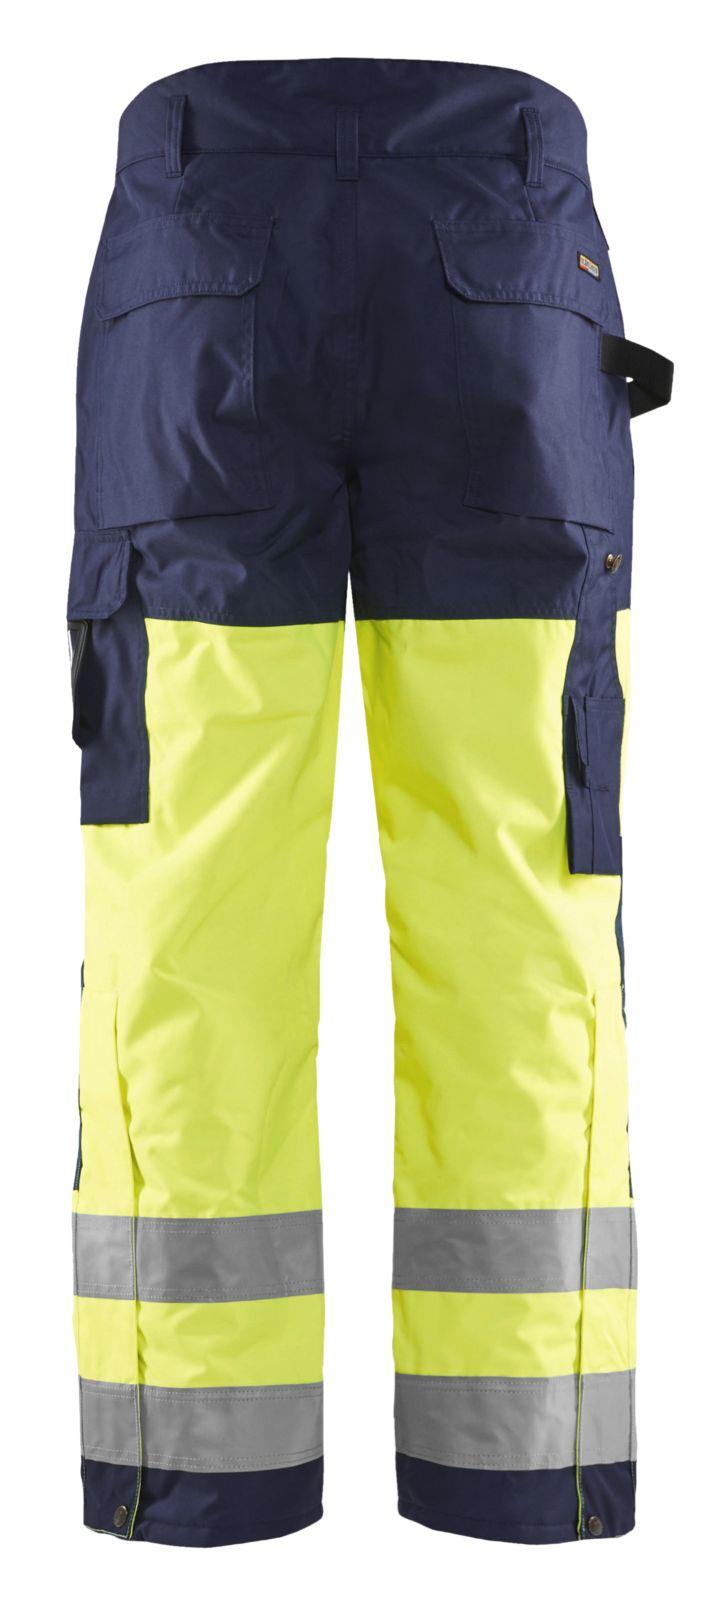 Blaklader Winterwerkbroeken 18831997 High Vis geel-marineblauw(3389)